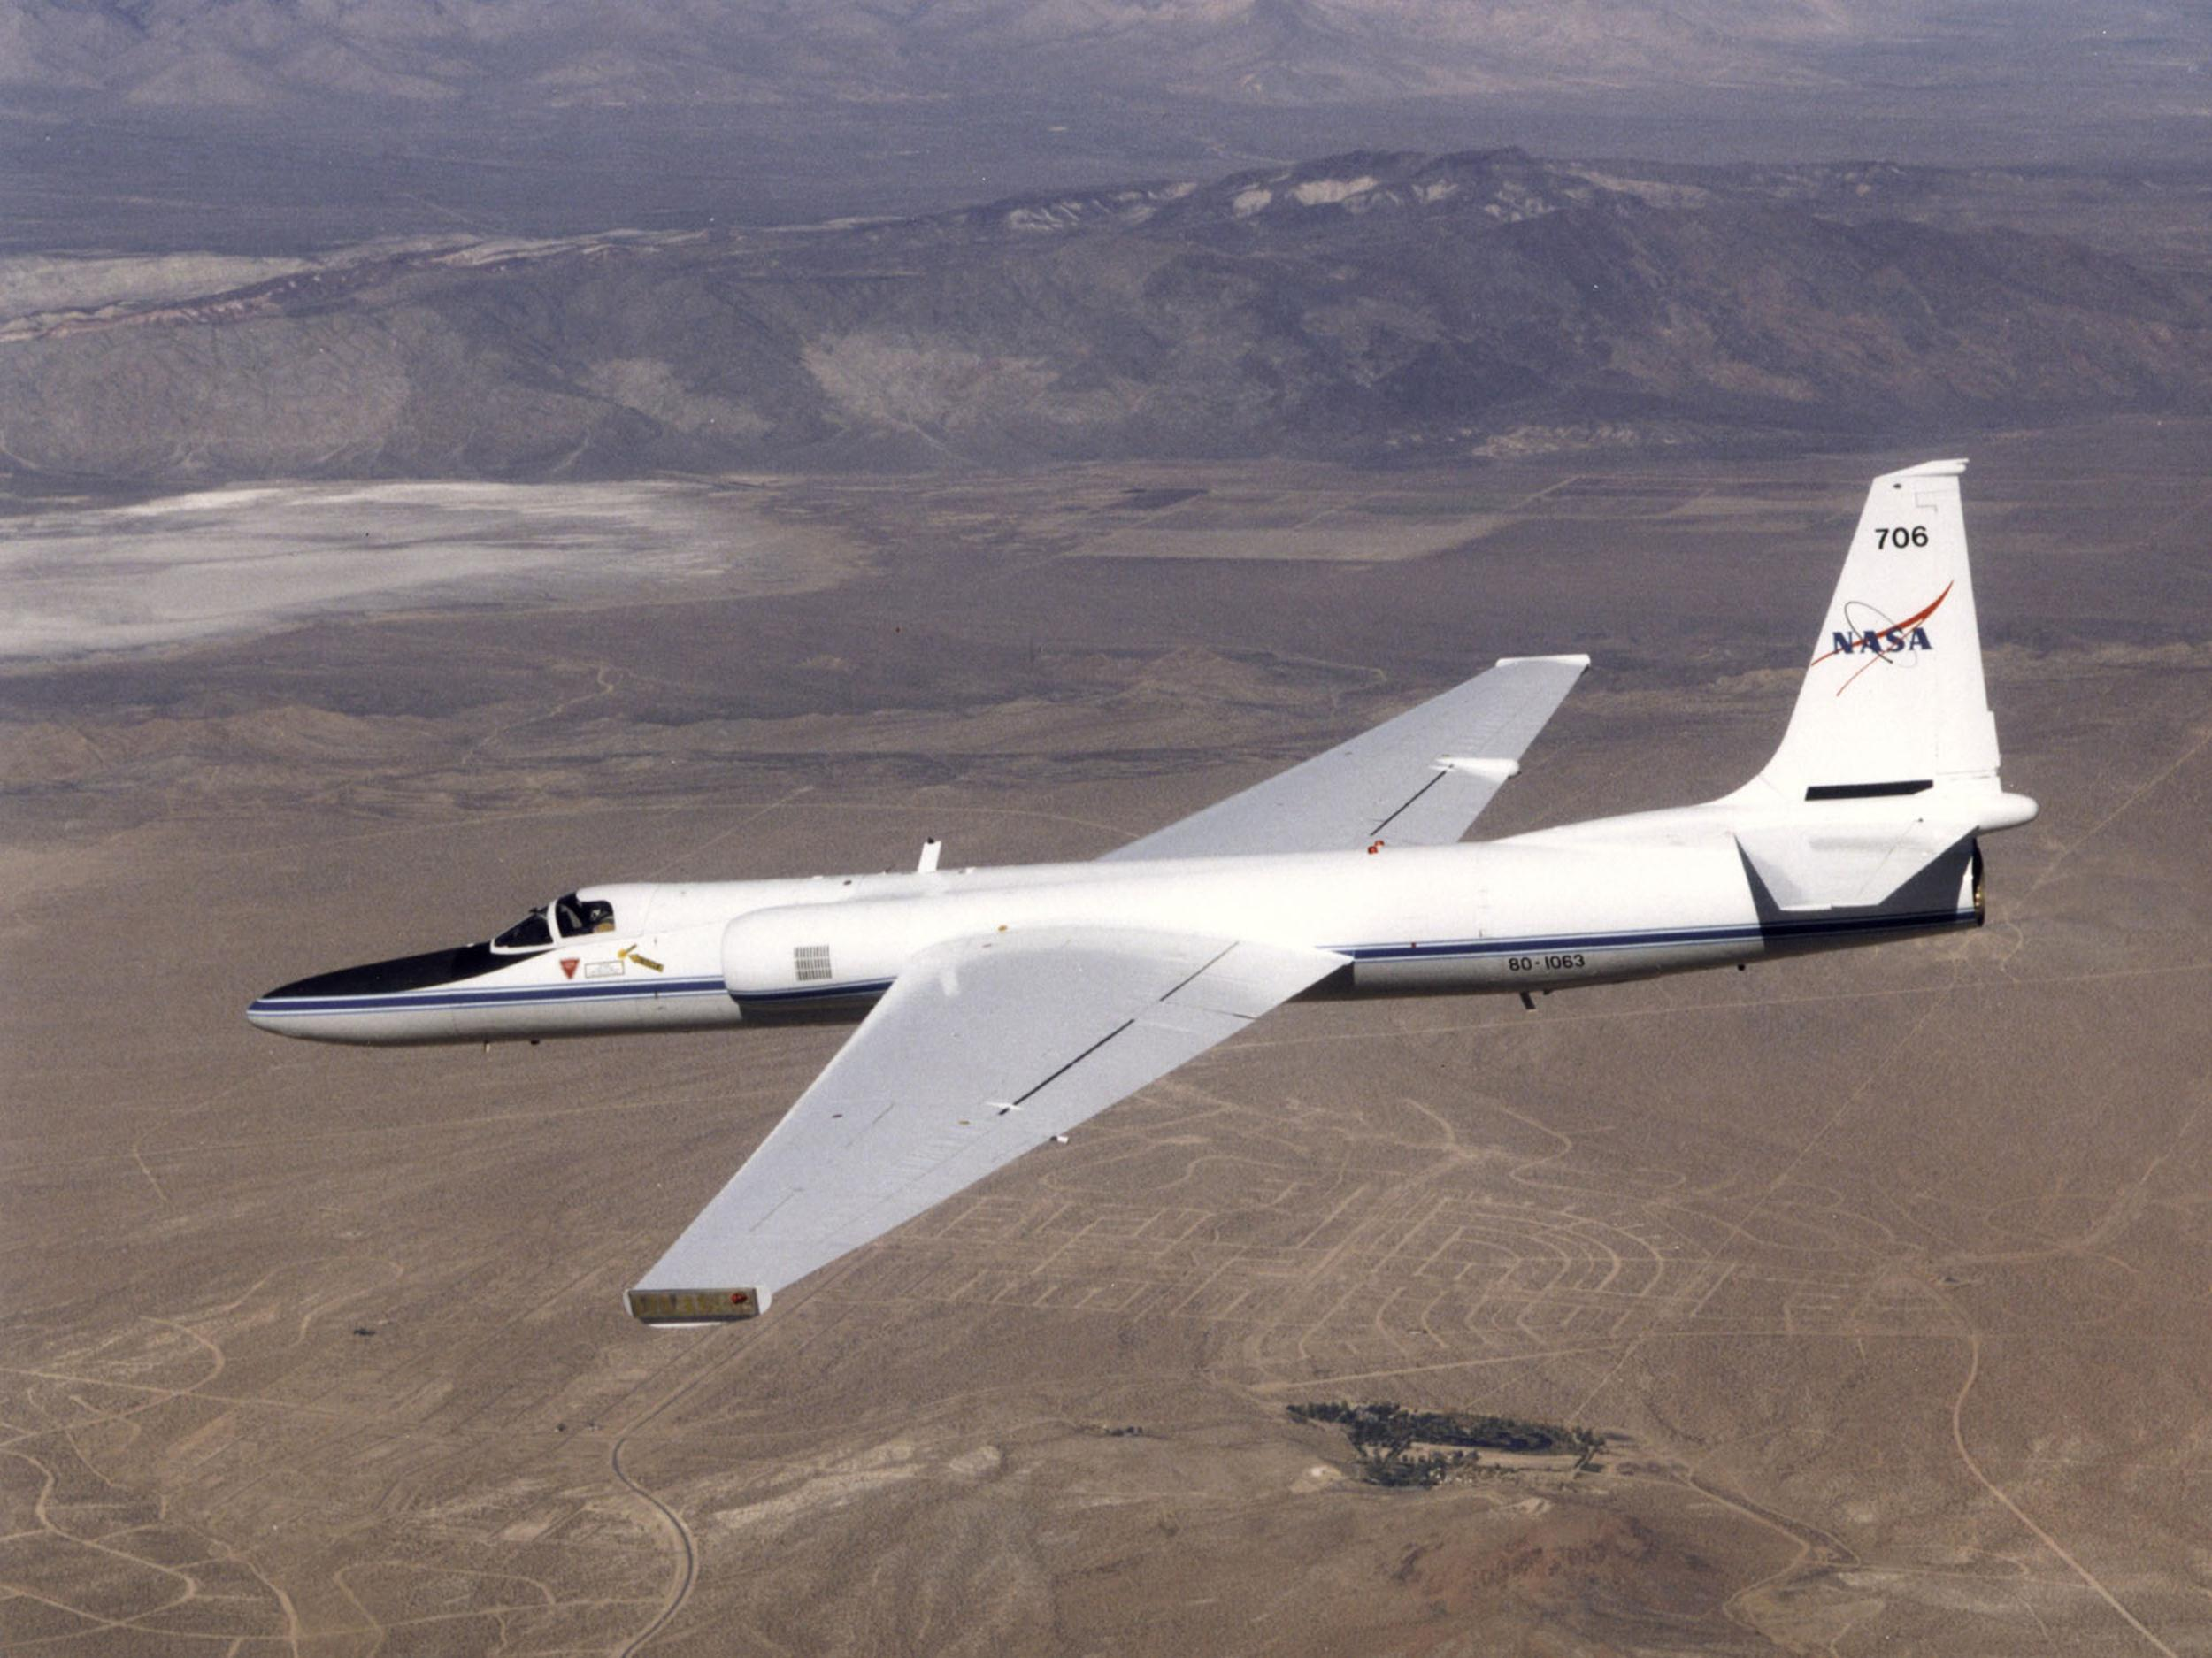 ER2 AIRCRAFT IN FLIGHT